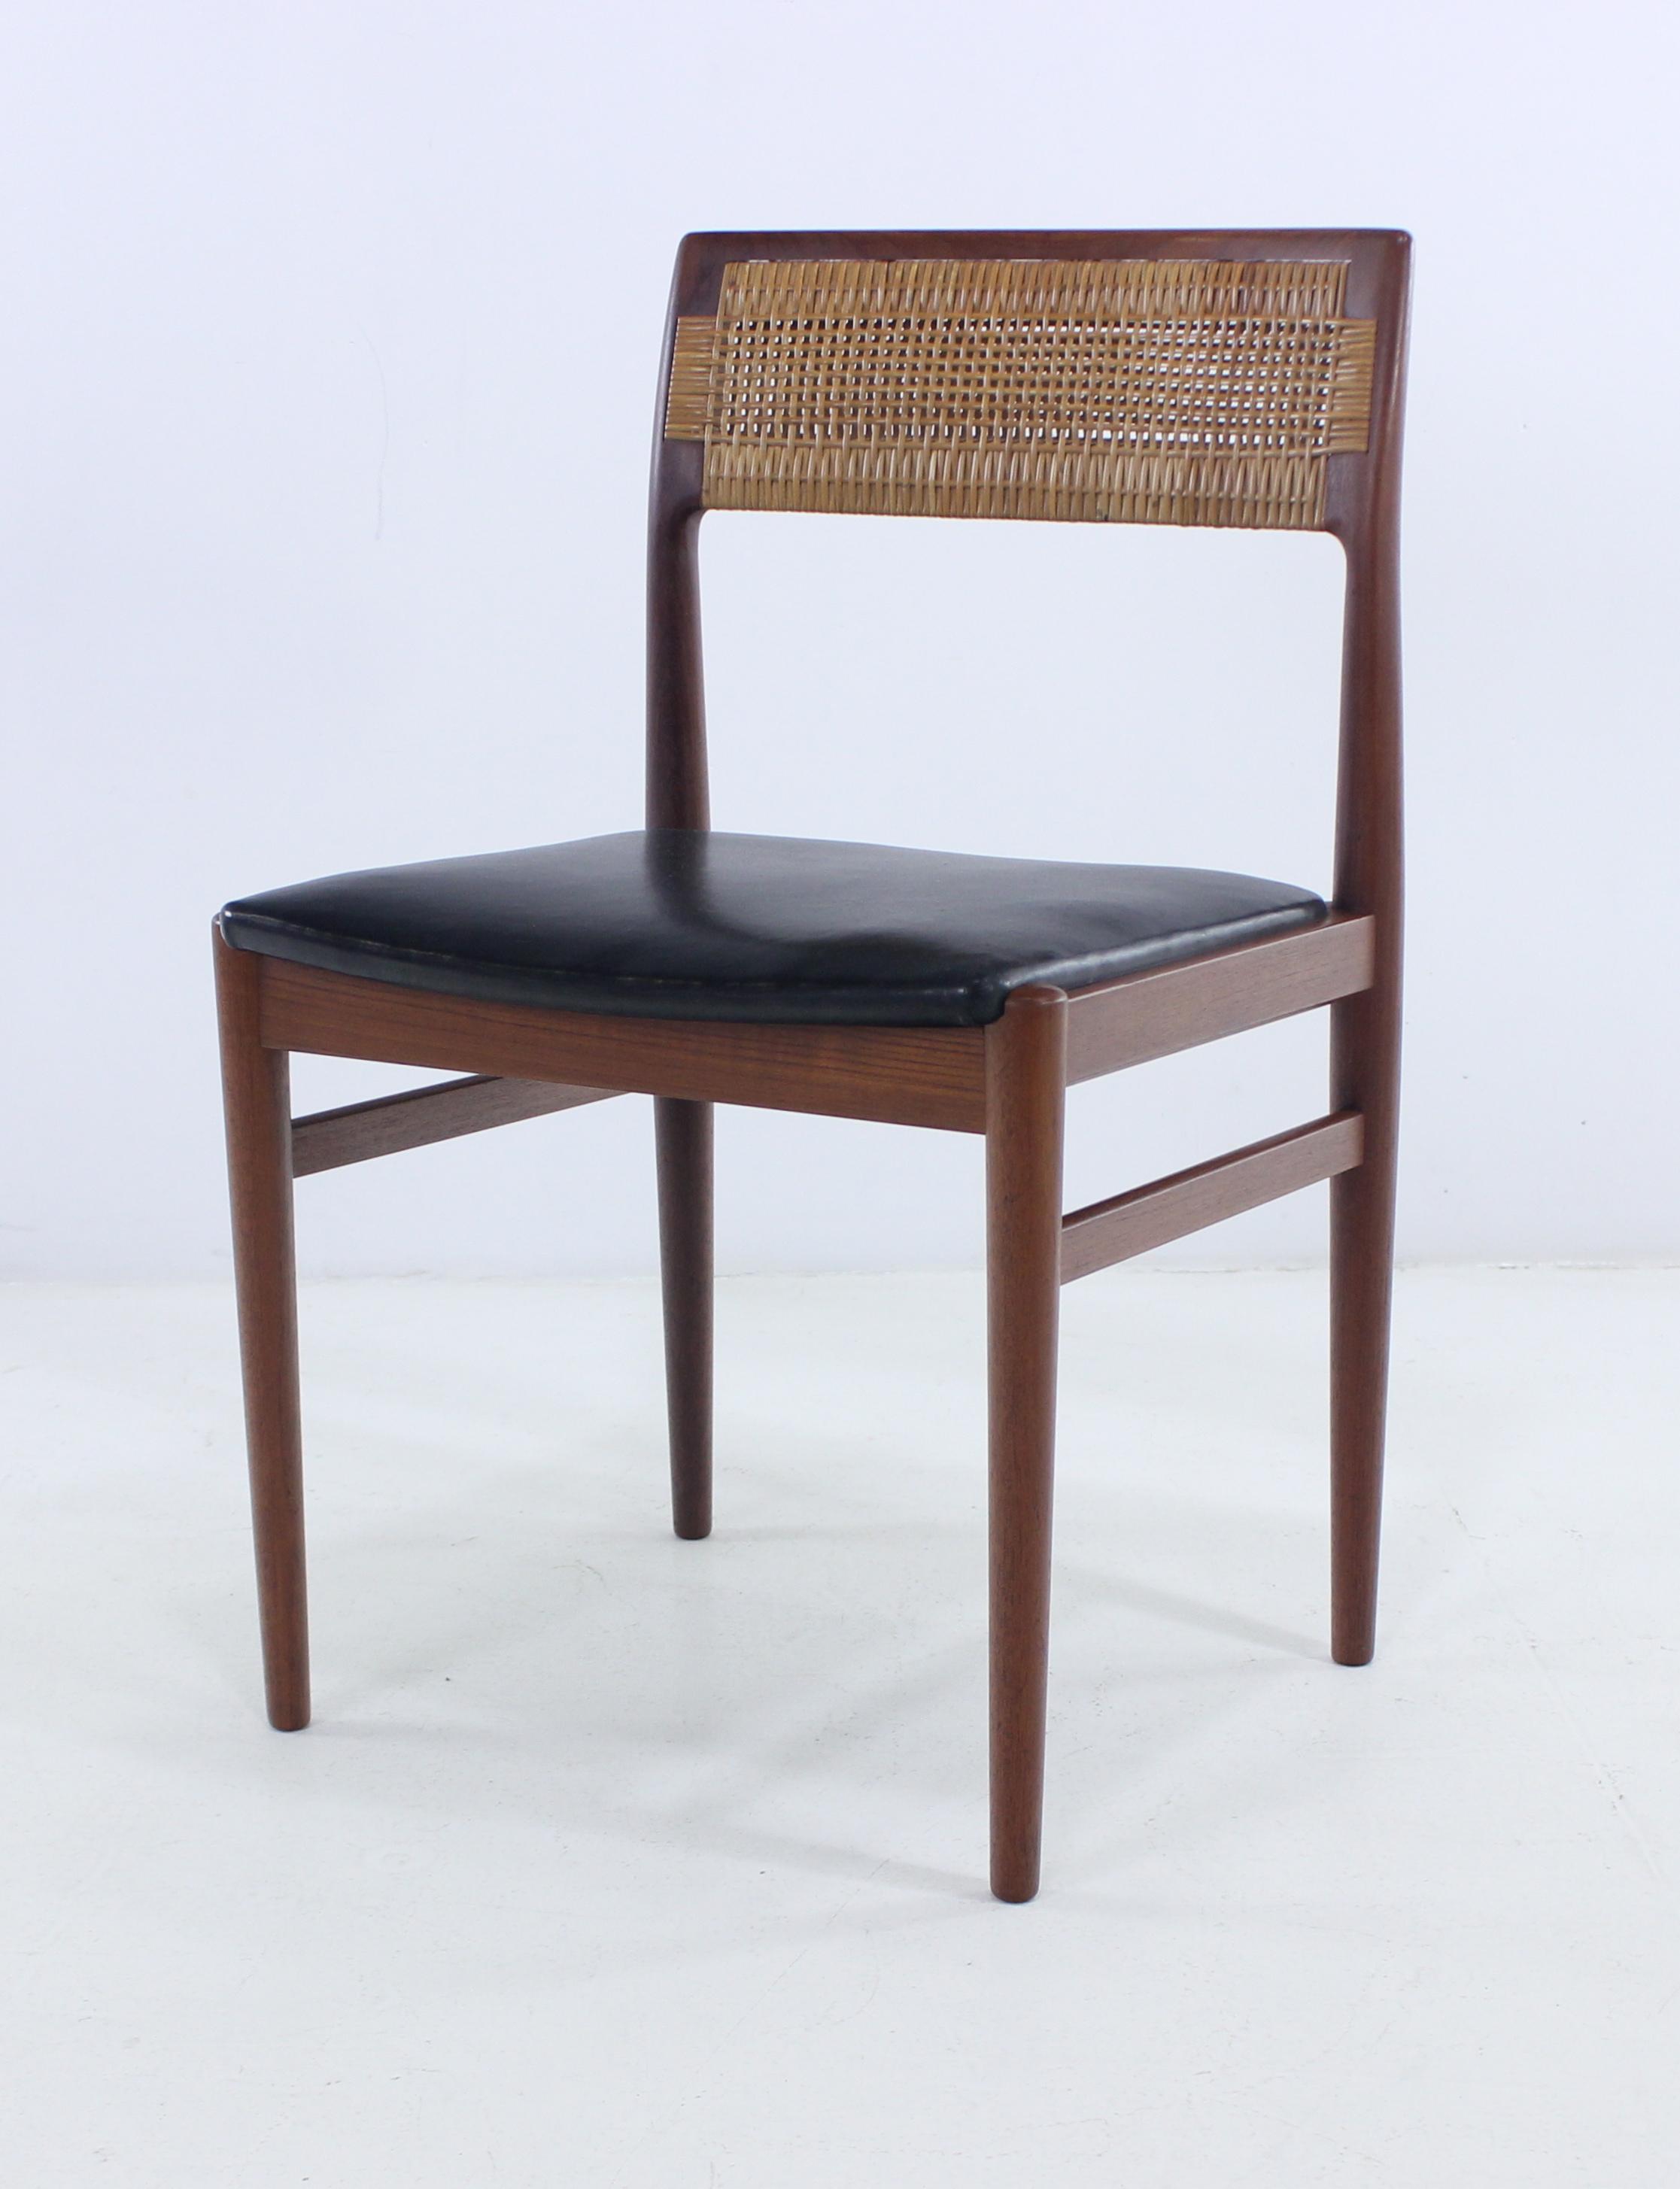 Set of Eight Distinctive Danish Modern Teak Dining Chairs Designed